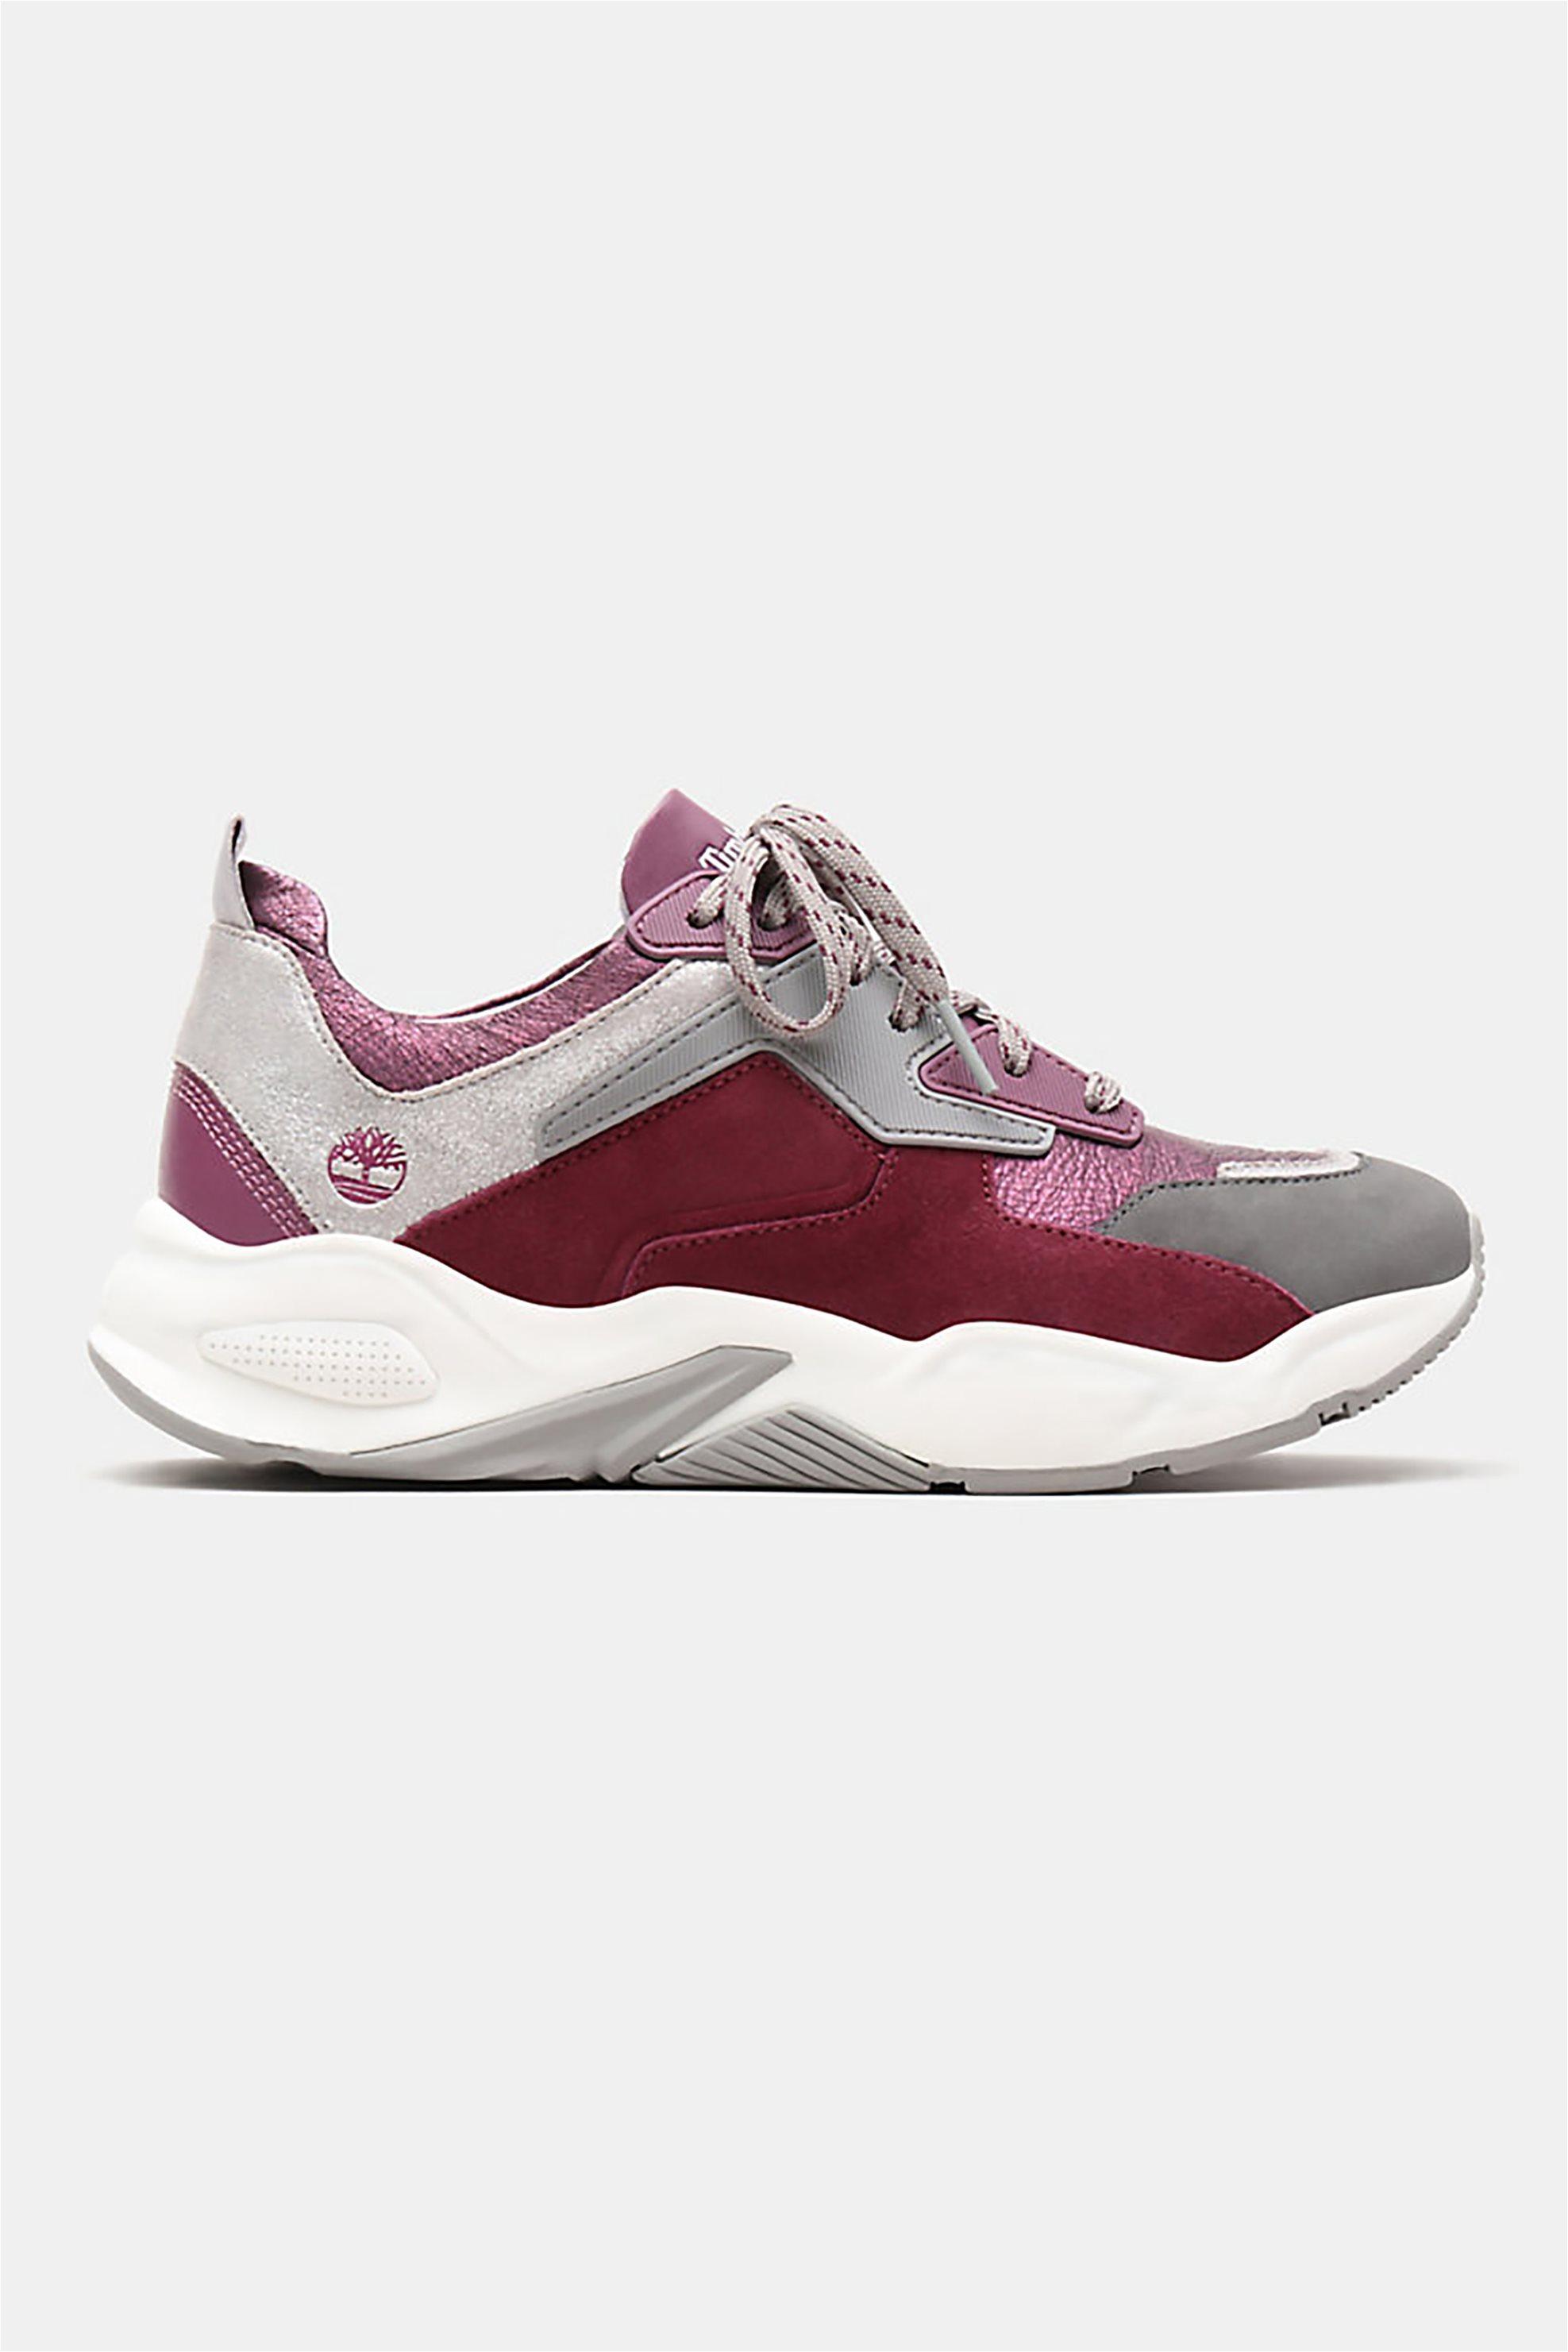 Timberland γυναικεία sneakers με κορδόνια Delphiville – TB0A23EMX341 – Μοβ